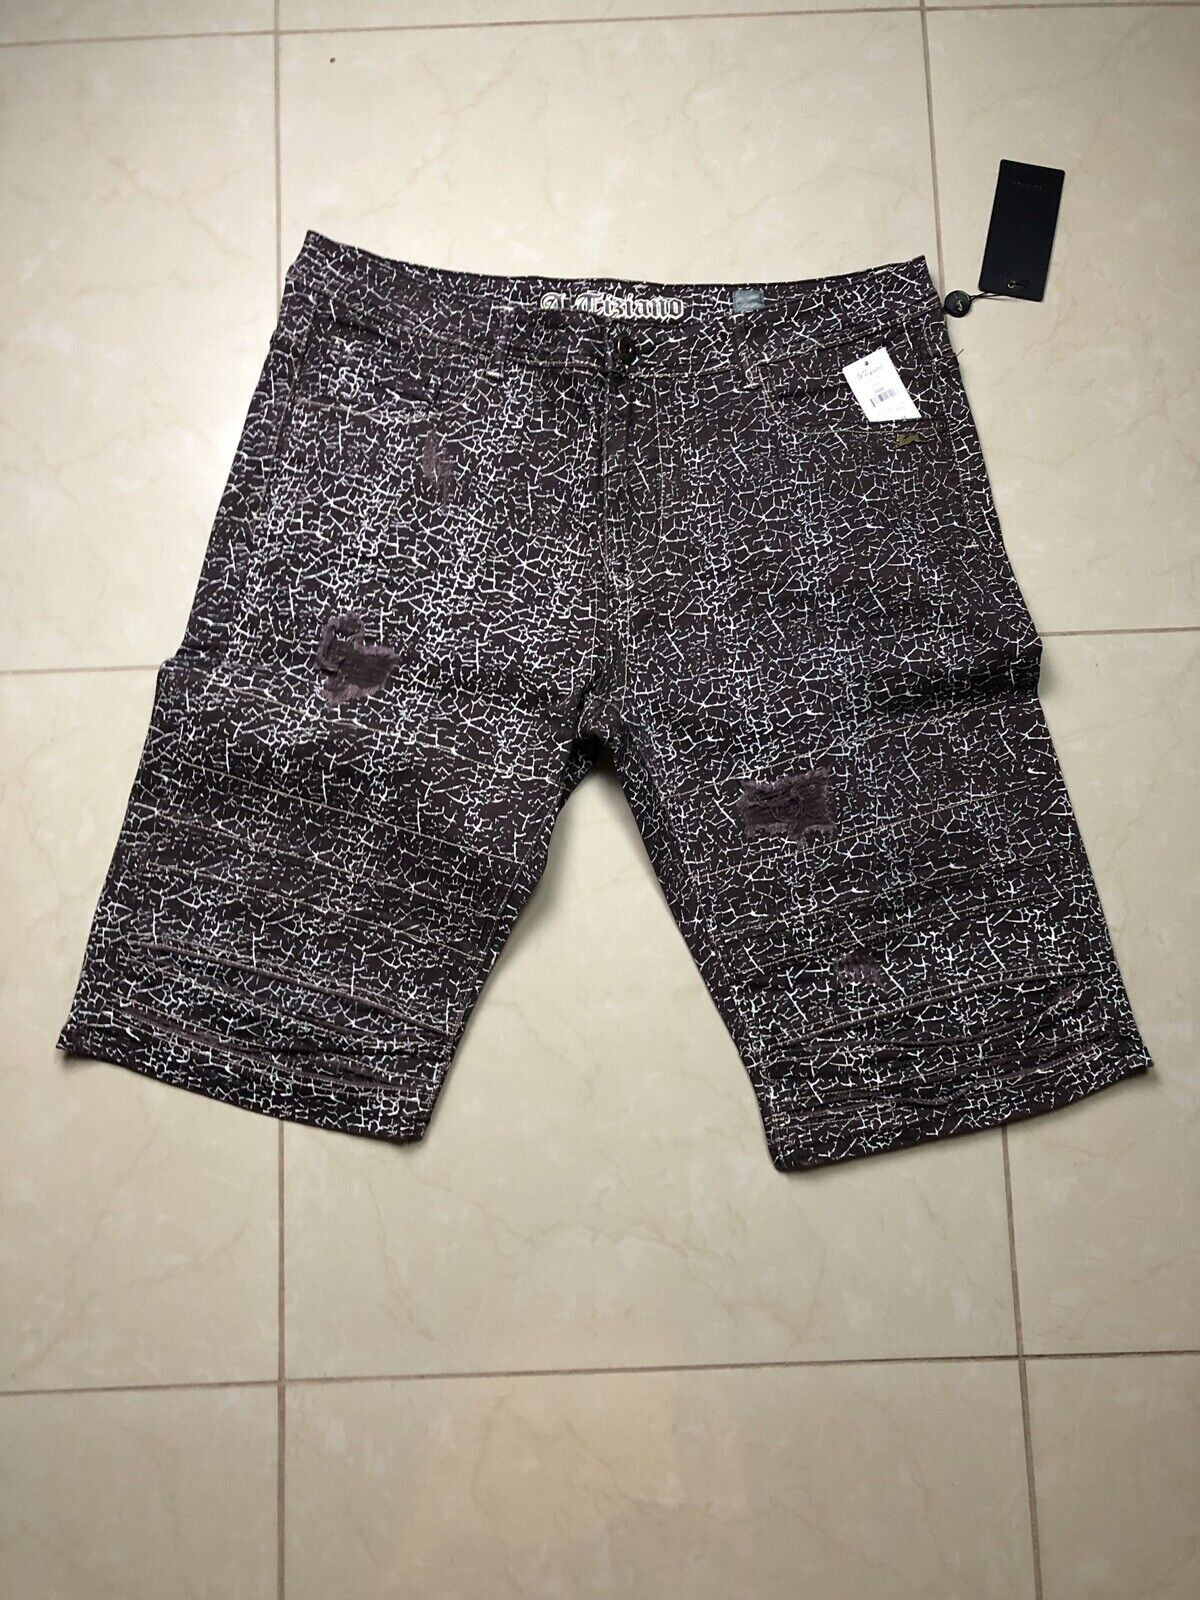 Atiziano Brown Bark Shorts Size 44